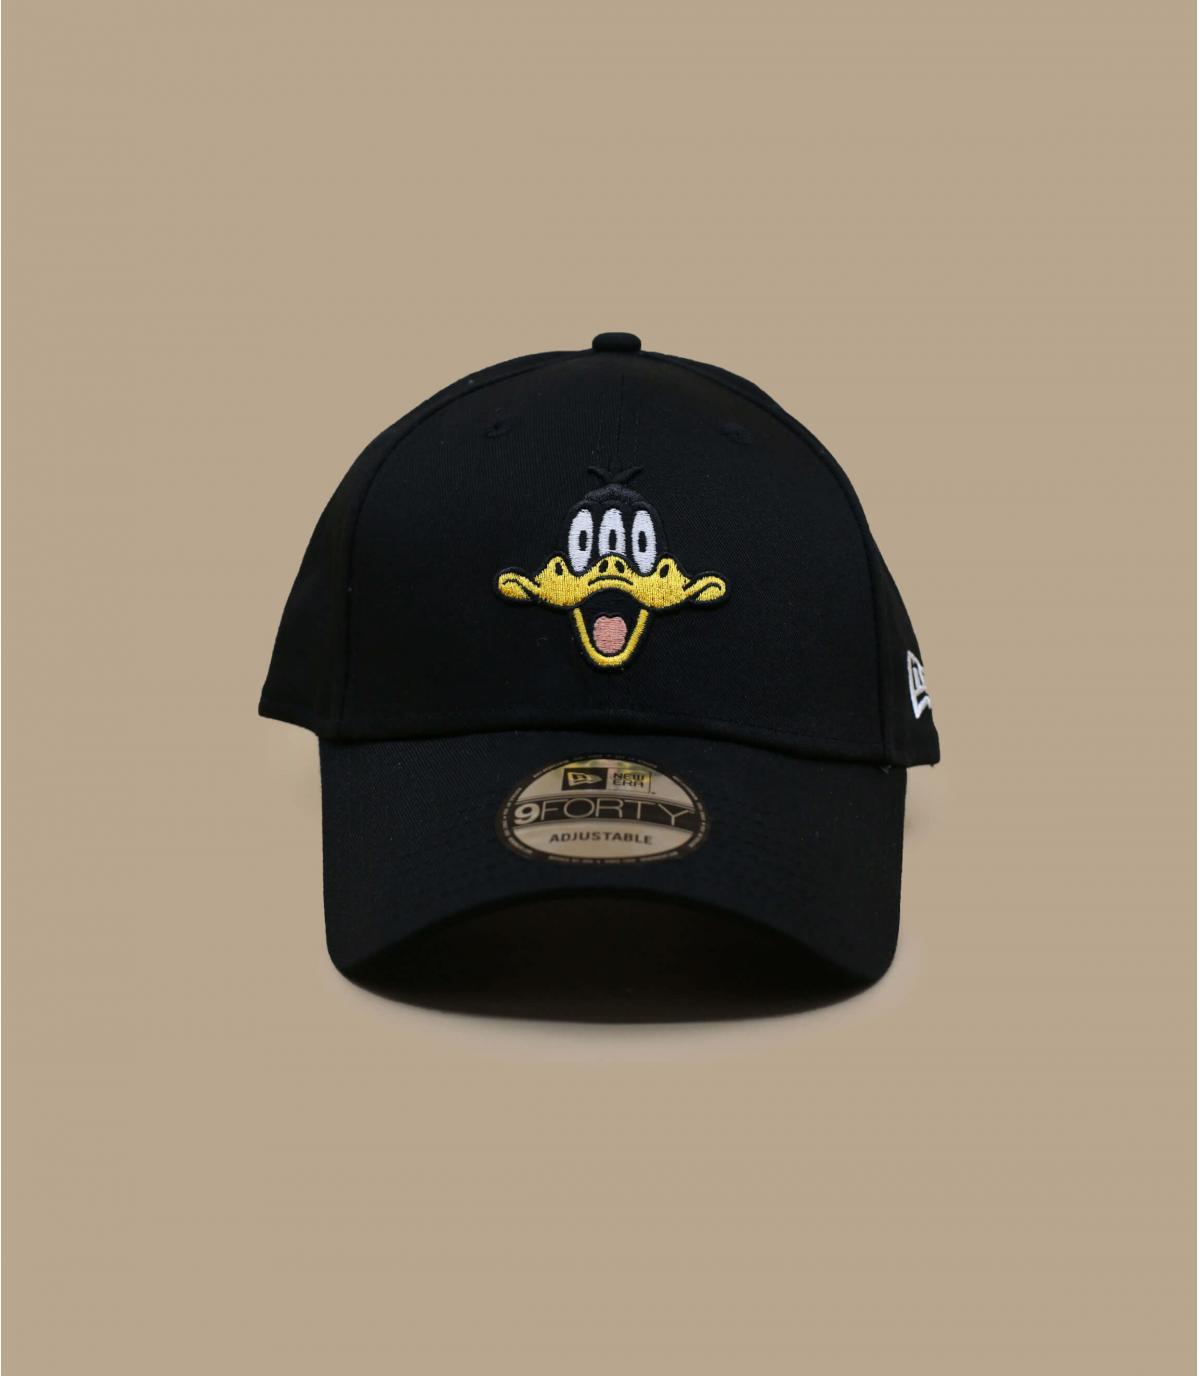 casquette noire Daffy Duck